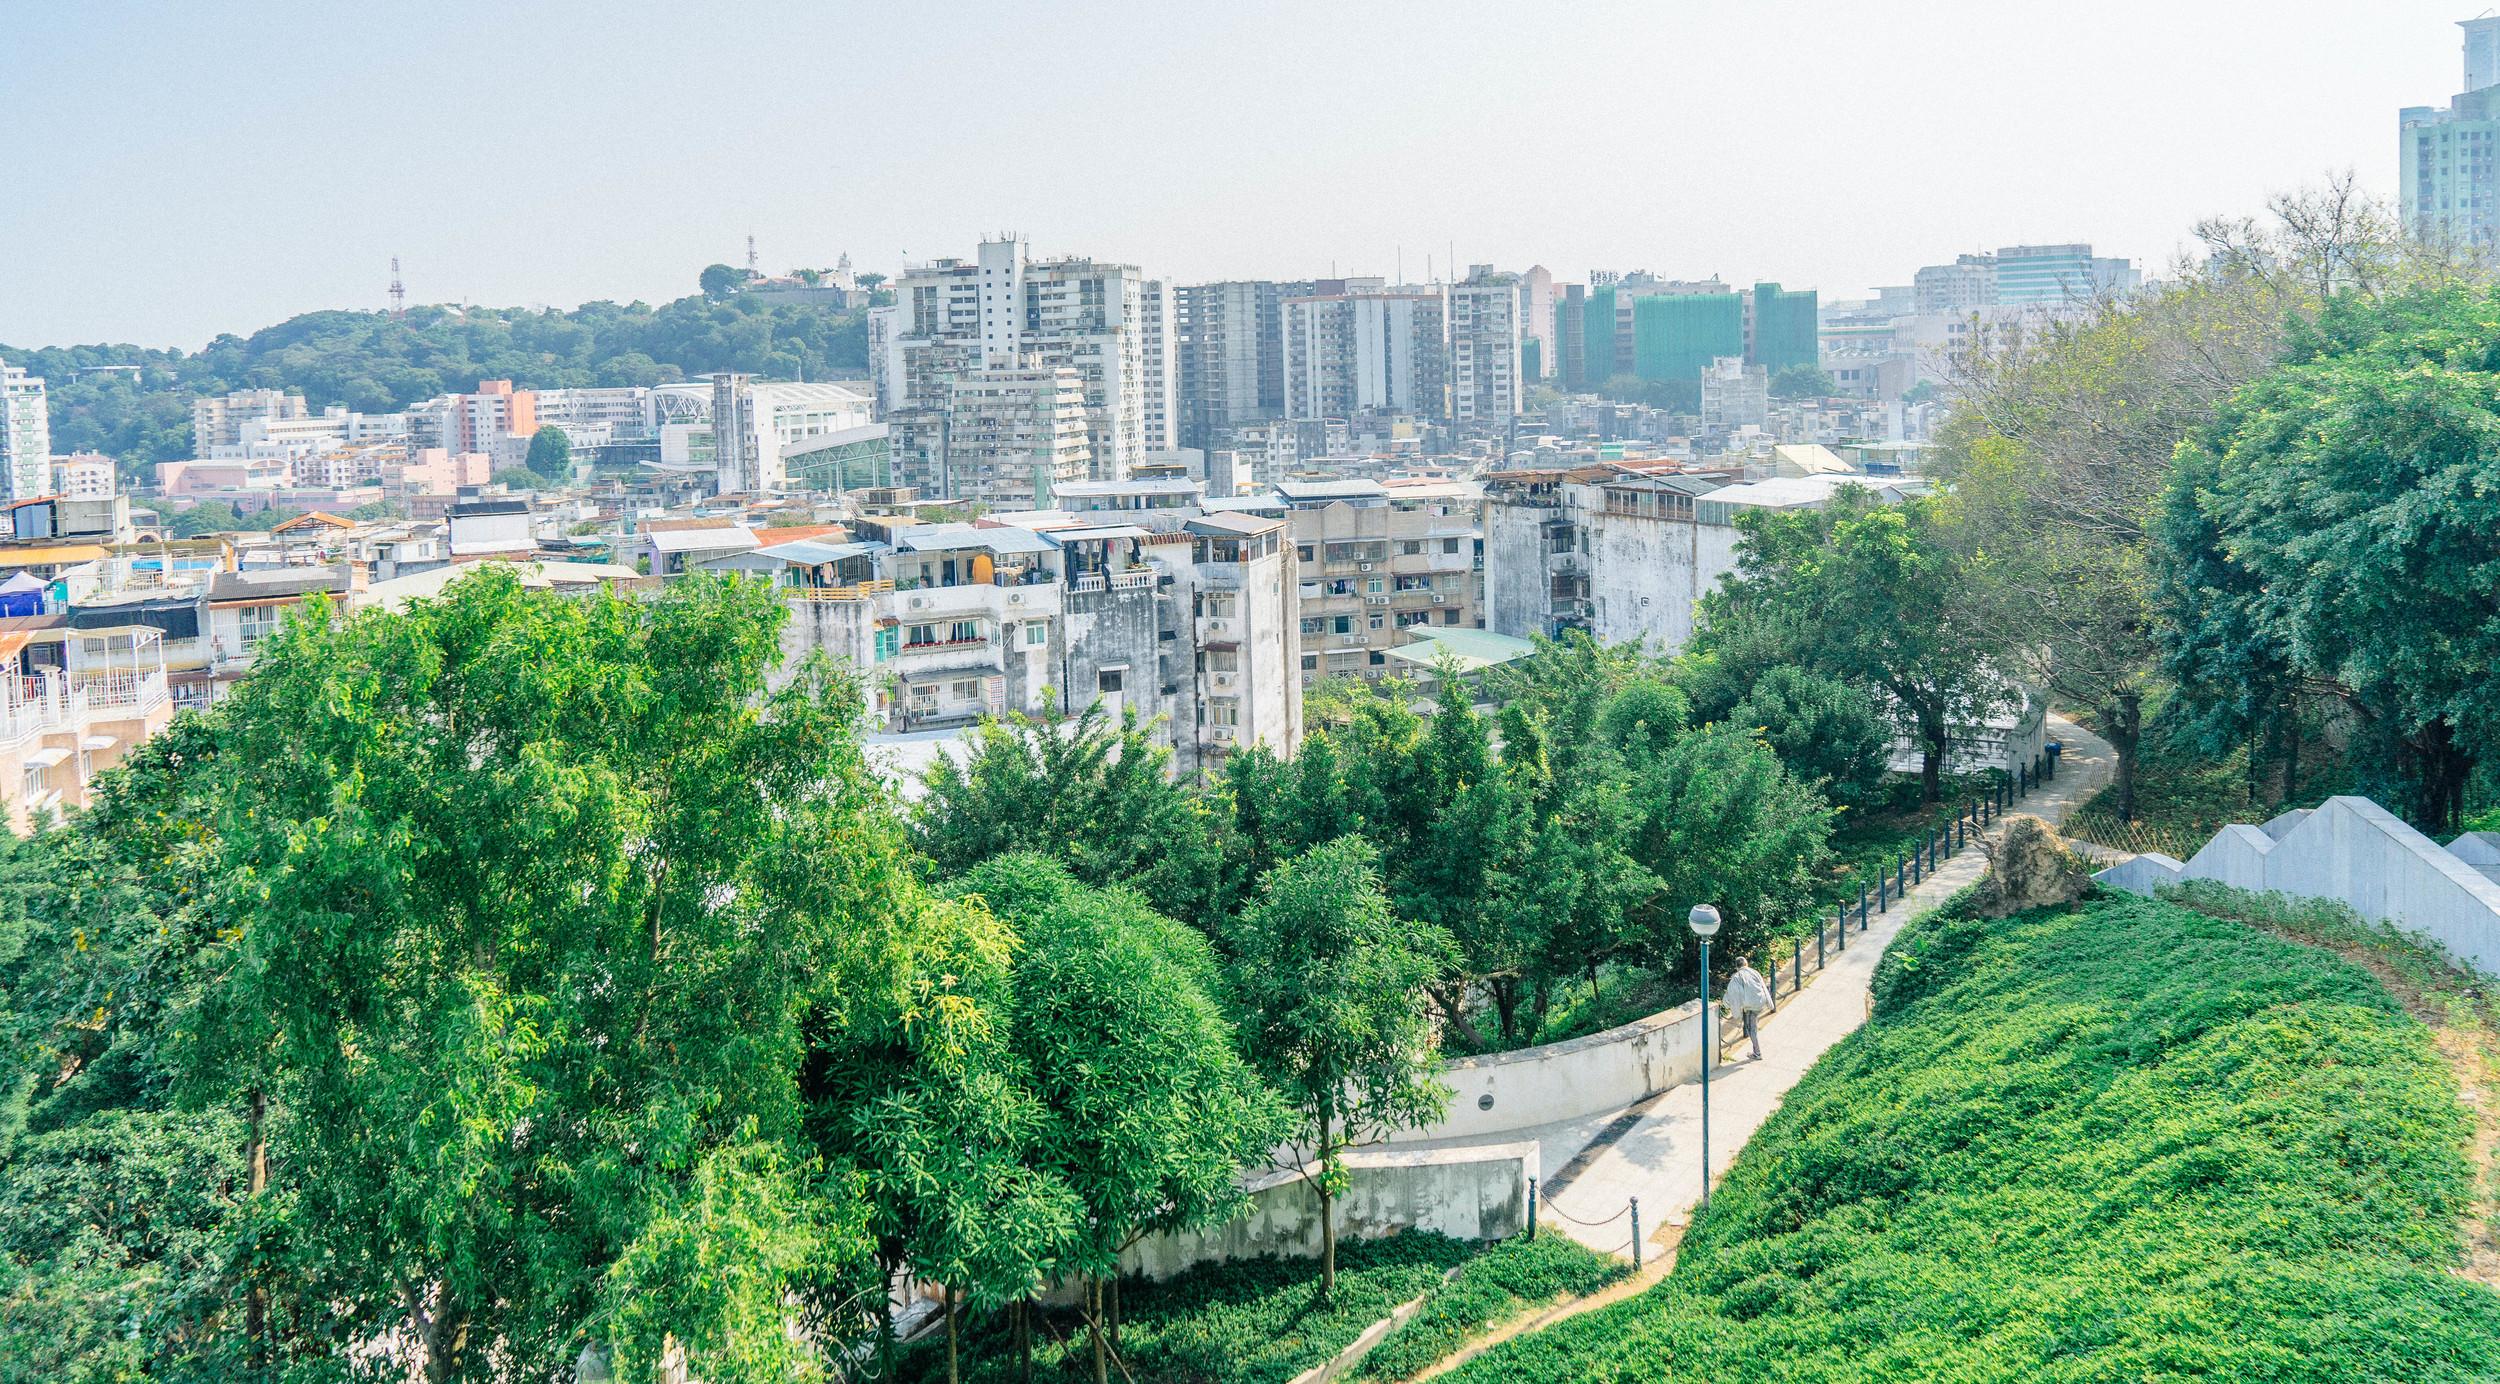 Macau Skyline (2/3)